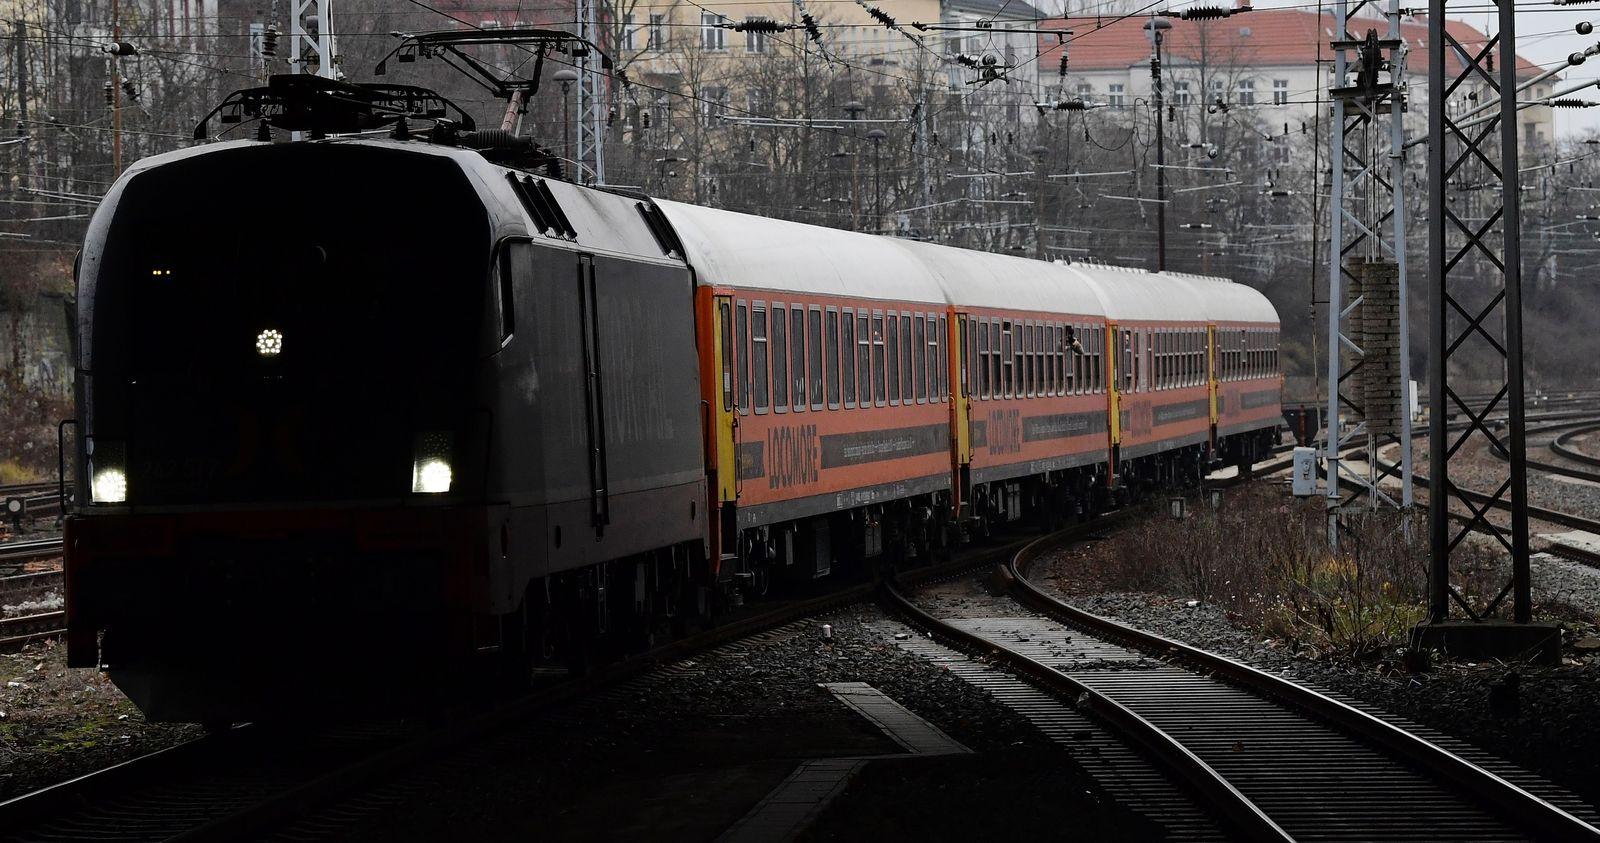 FILES-GERMANY-RAIL-TRANSPORT-COMPANY